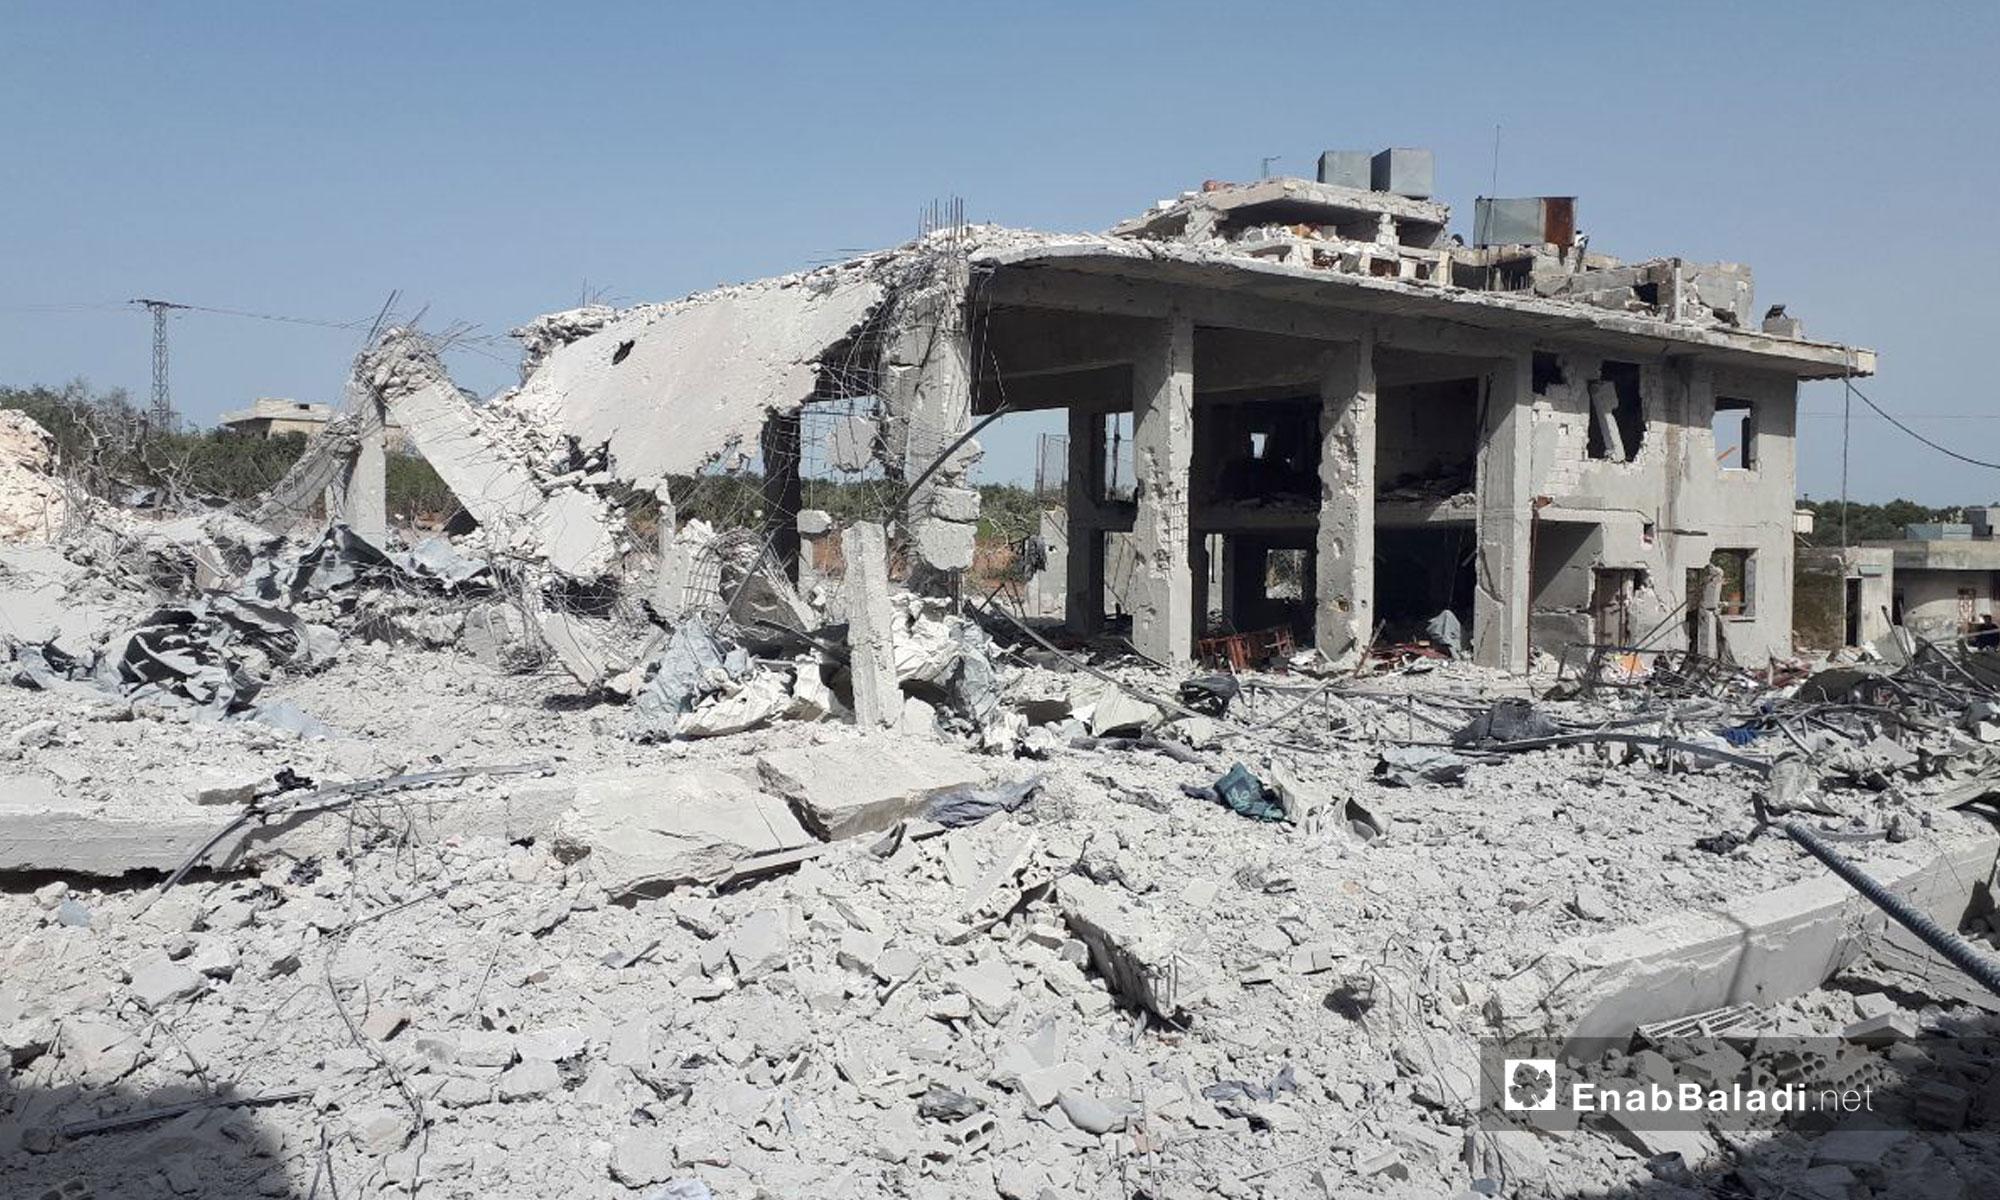 Destruction Caused by Russian Aerial Shelling in the village Urum al-Jawz, Southern rural Idlib, April 14, 2019 (Enab Baladi)